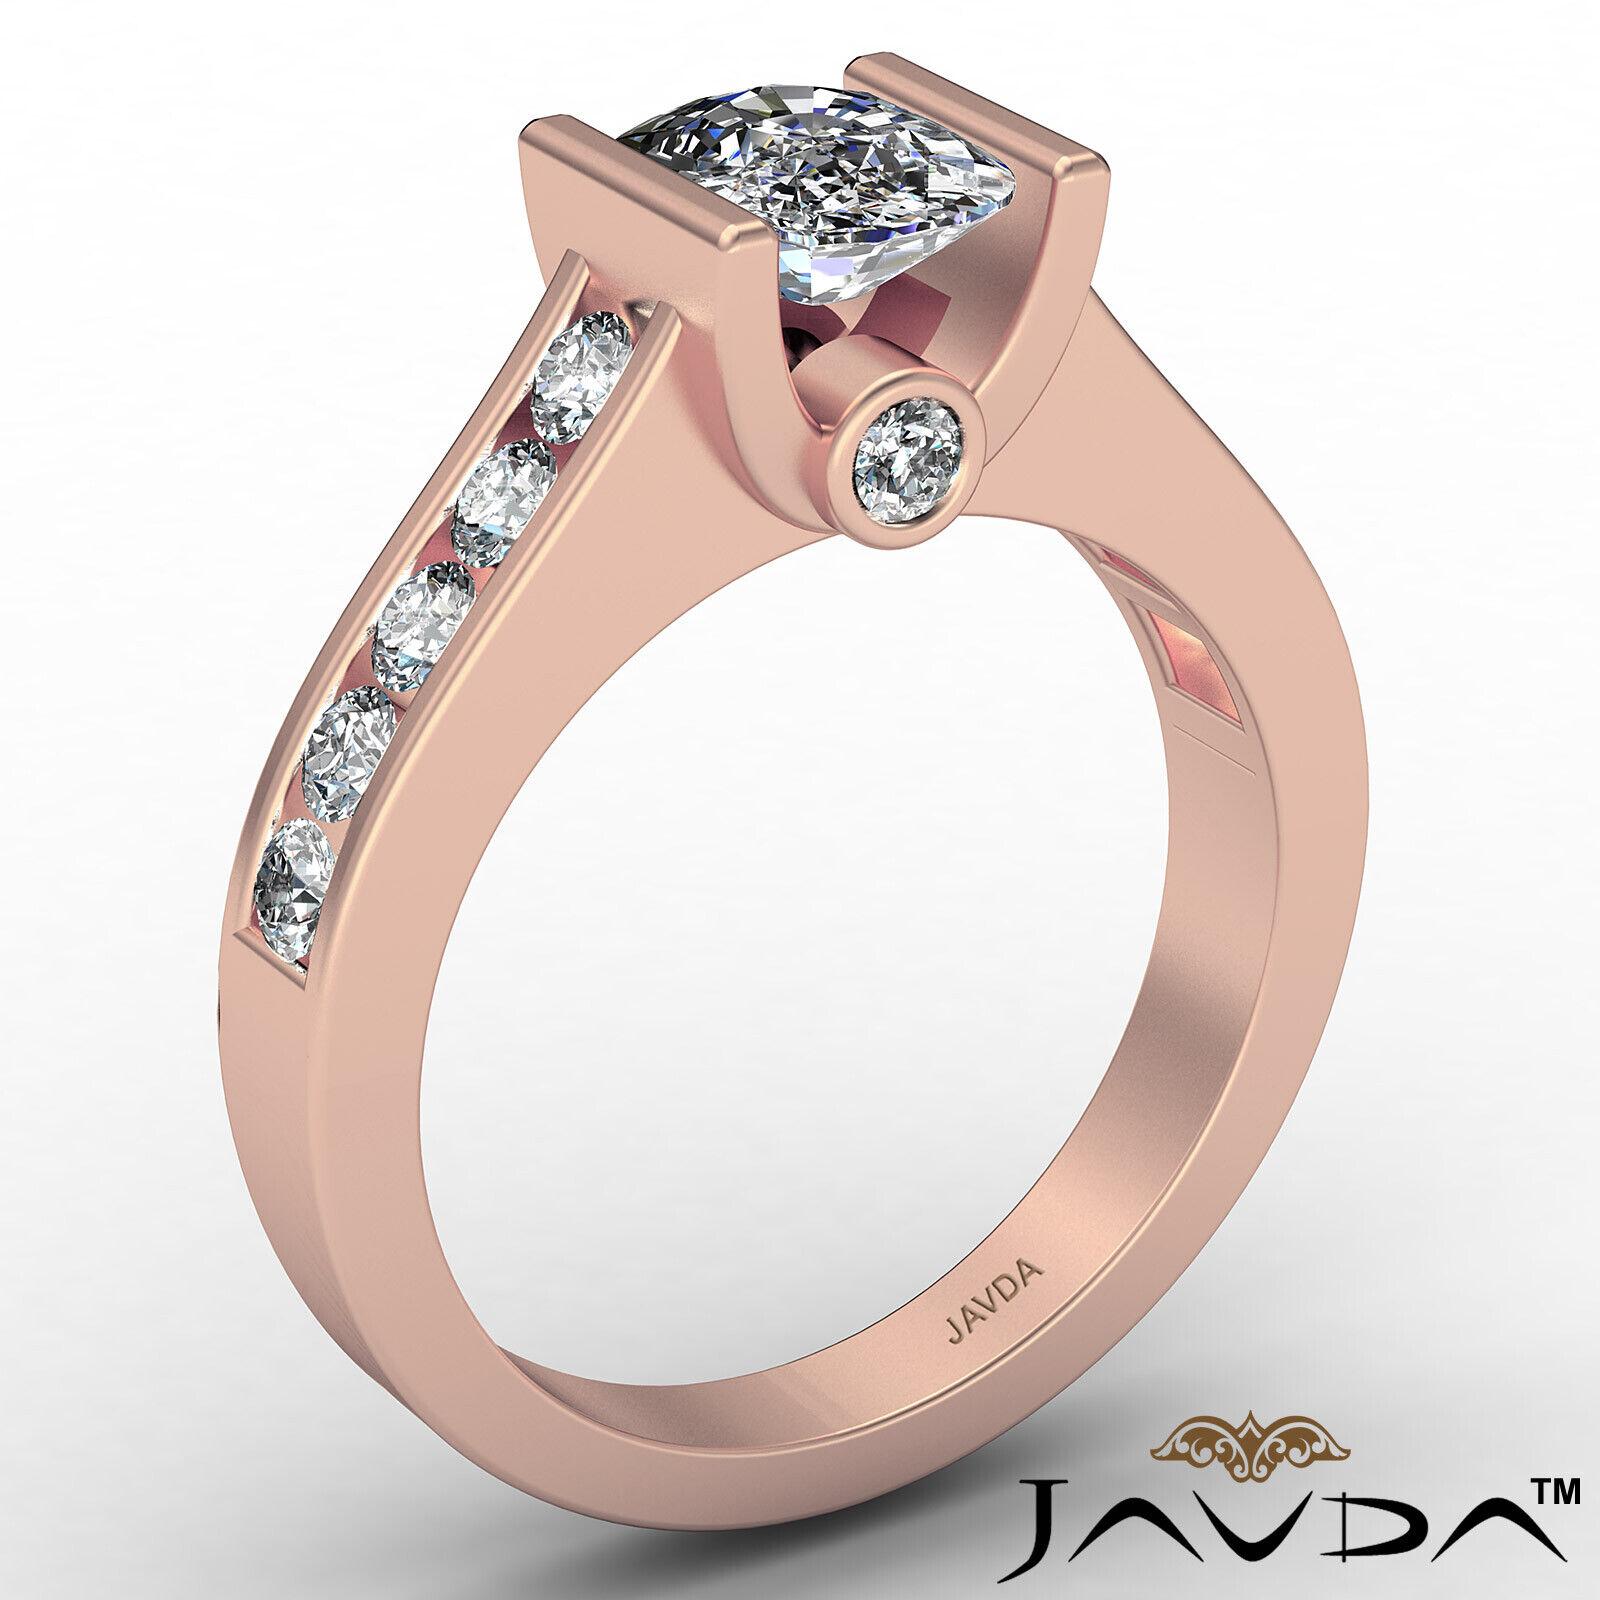 Bezel Cushion Diamond Engagement Women's Ring GIA, J Color SI1 clarity 1.53 ctw. 5